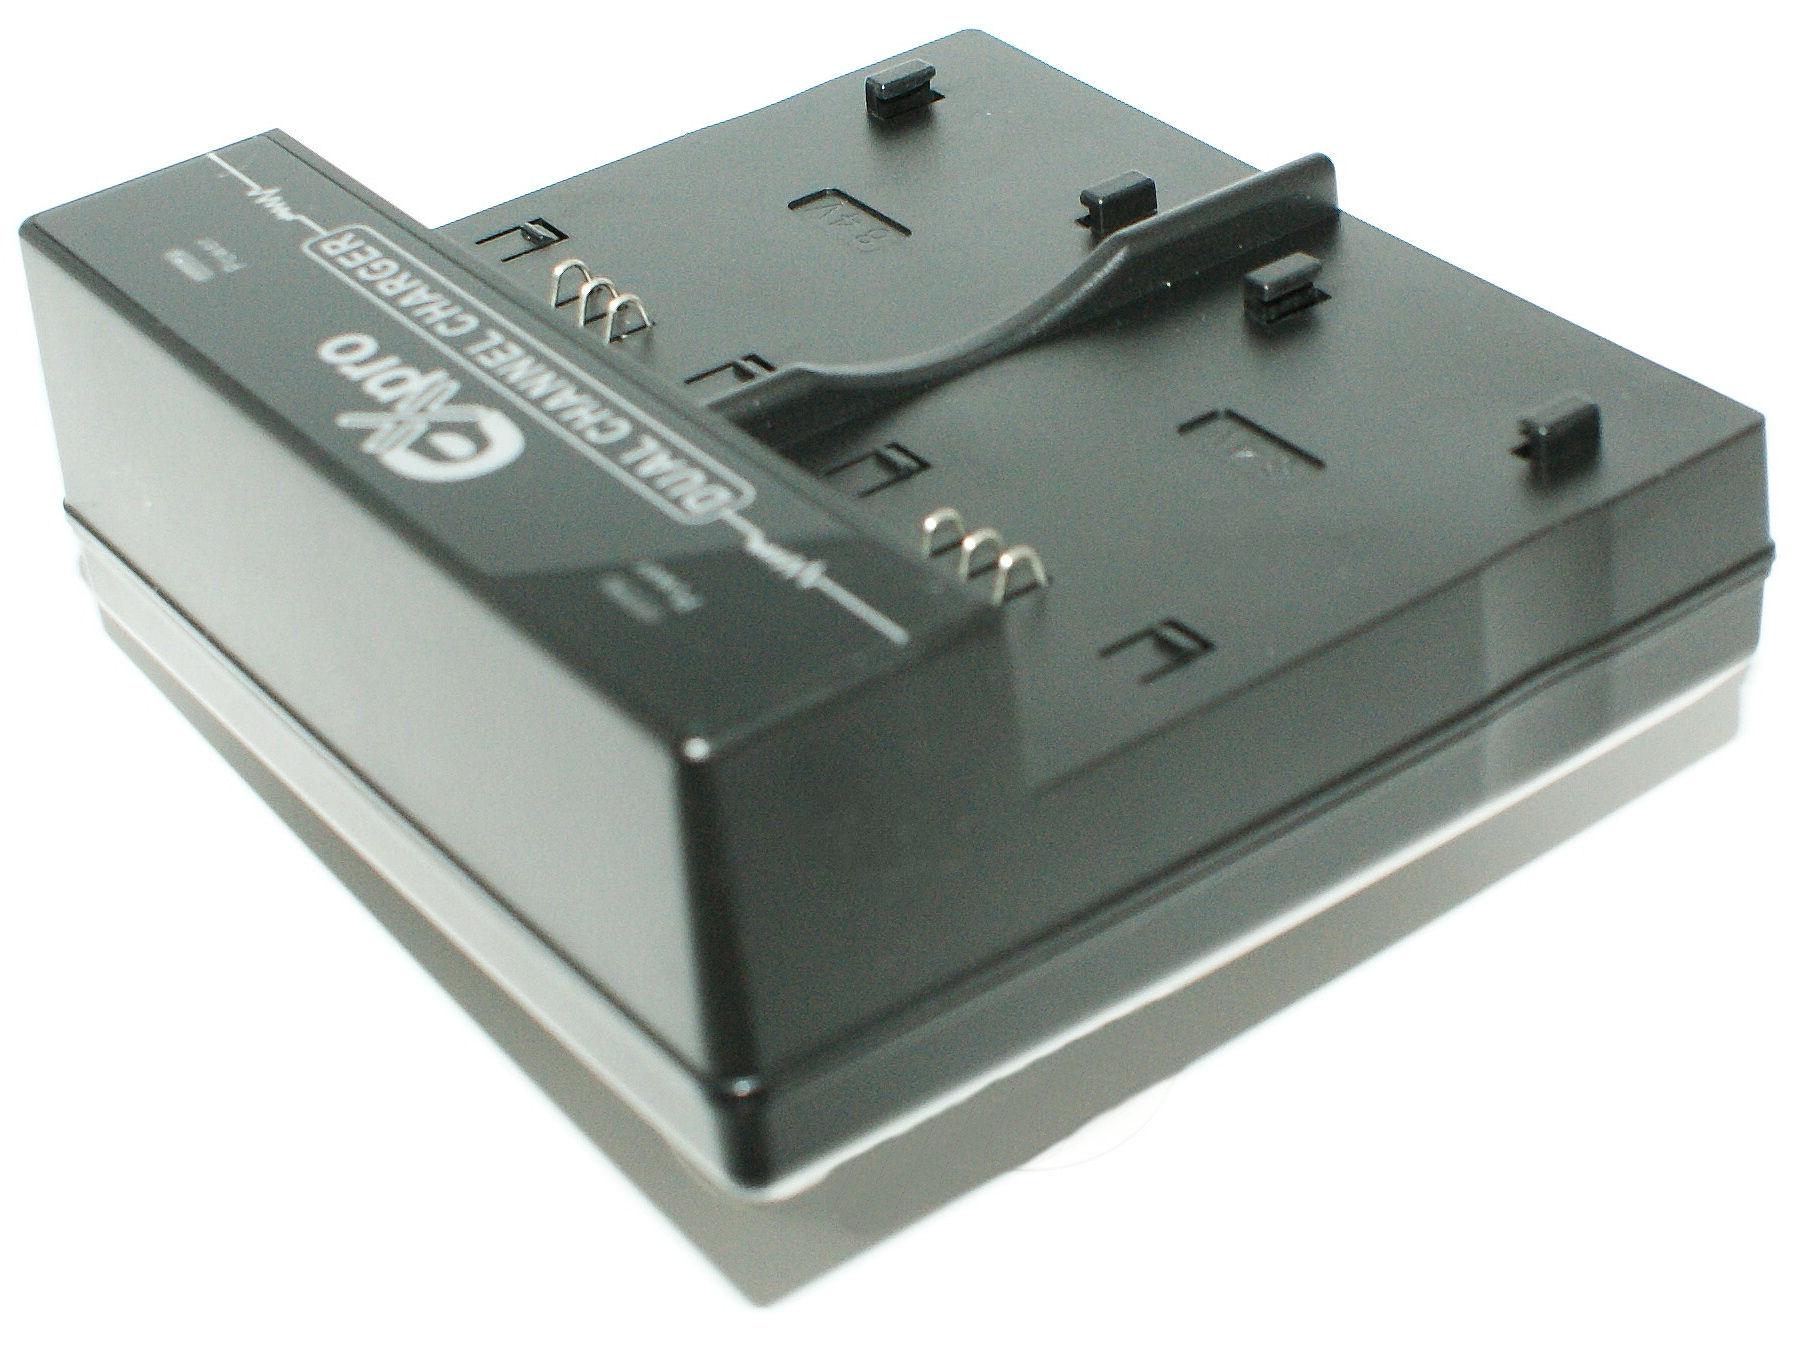 VWBC 10EBK-VW-VBL090 VW-VBK180 Doble cargador de batería para P @ VW-BC10